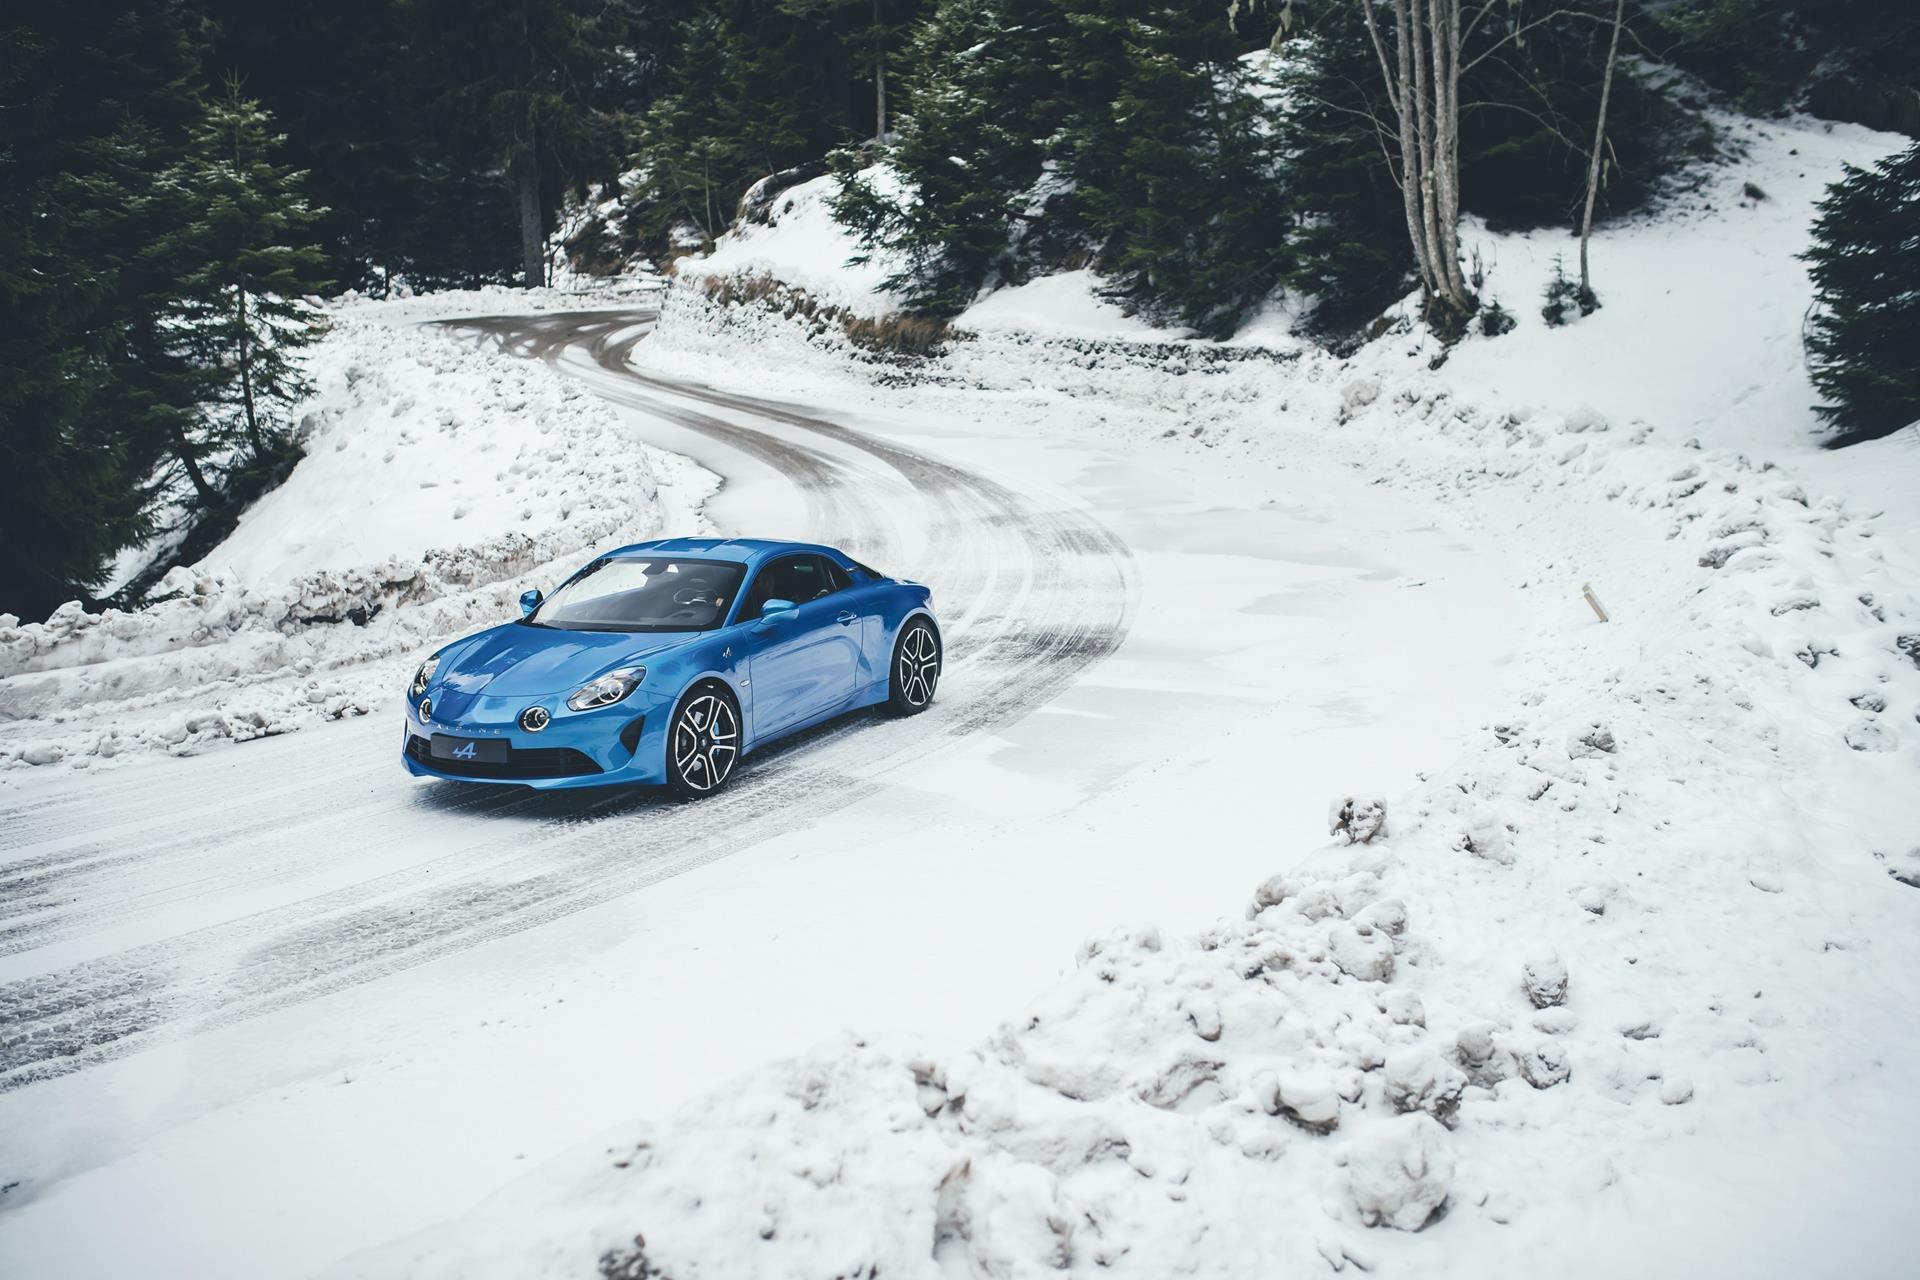 2017 Alpine A110